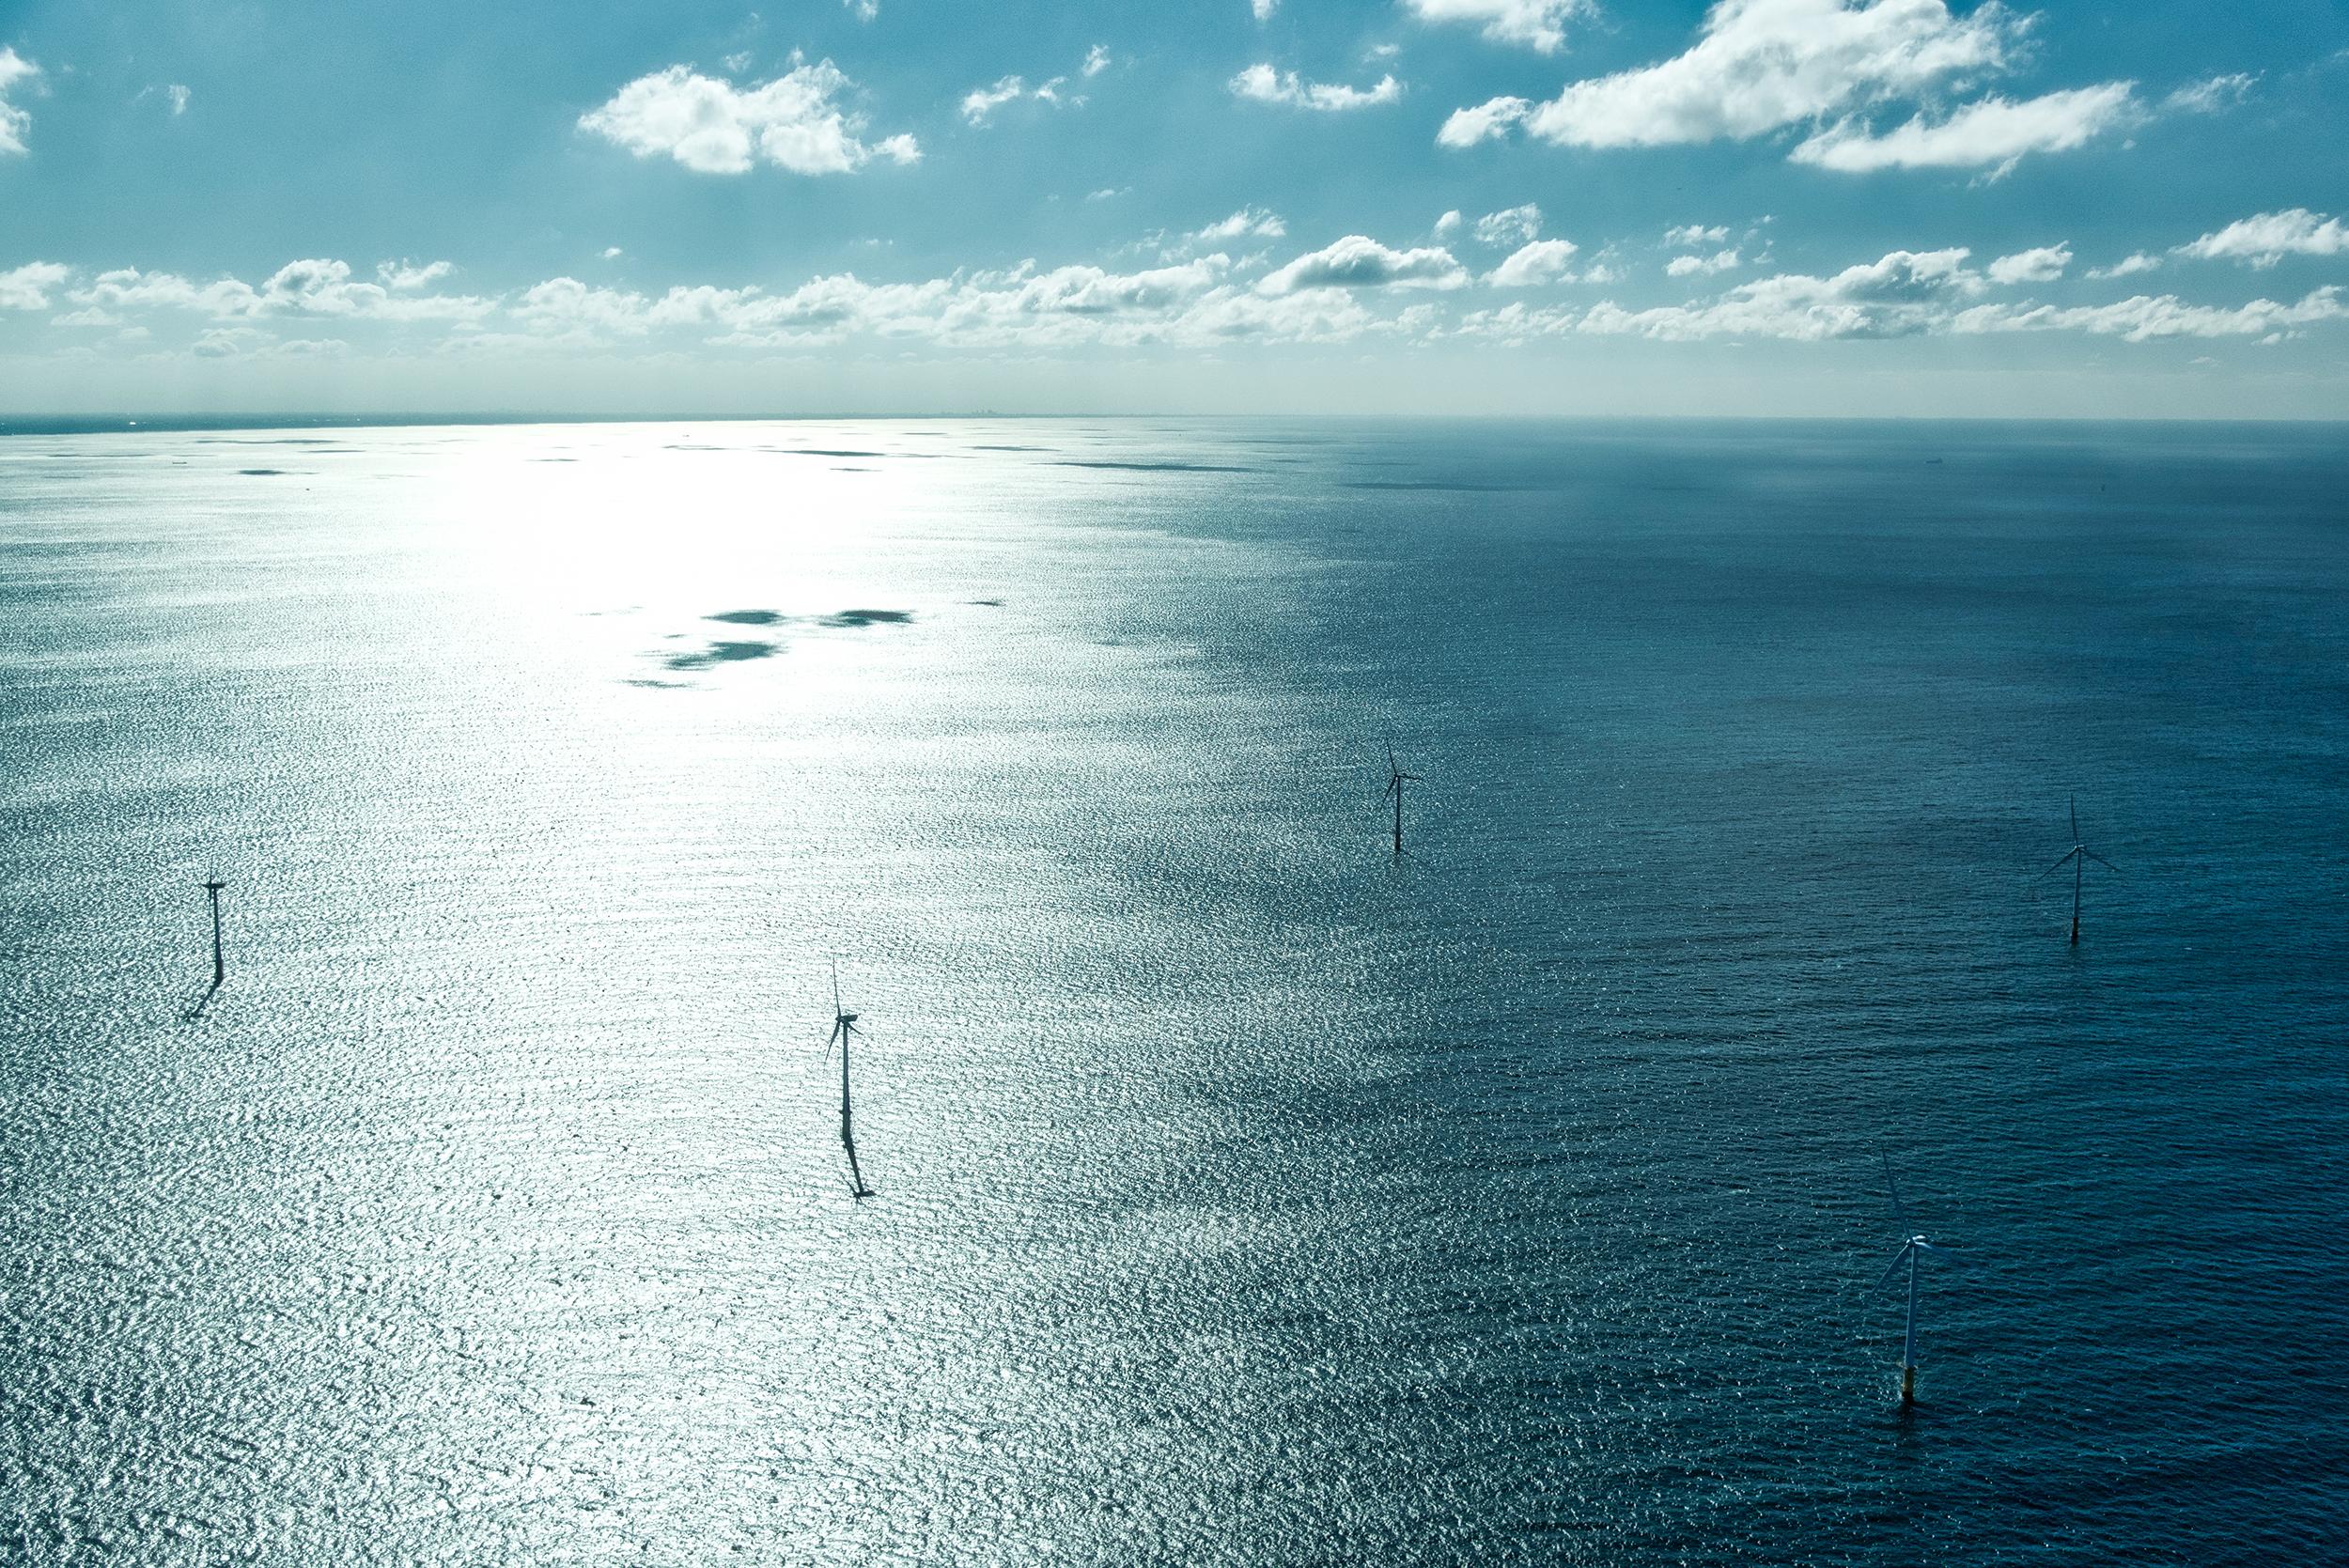 Windmolens Noordzee